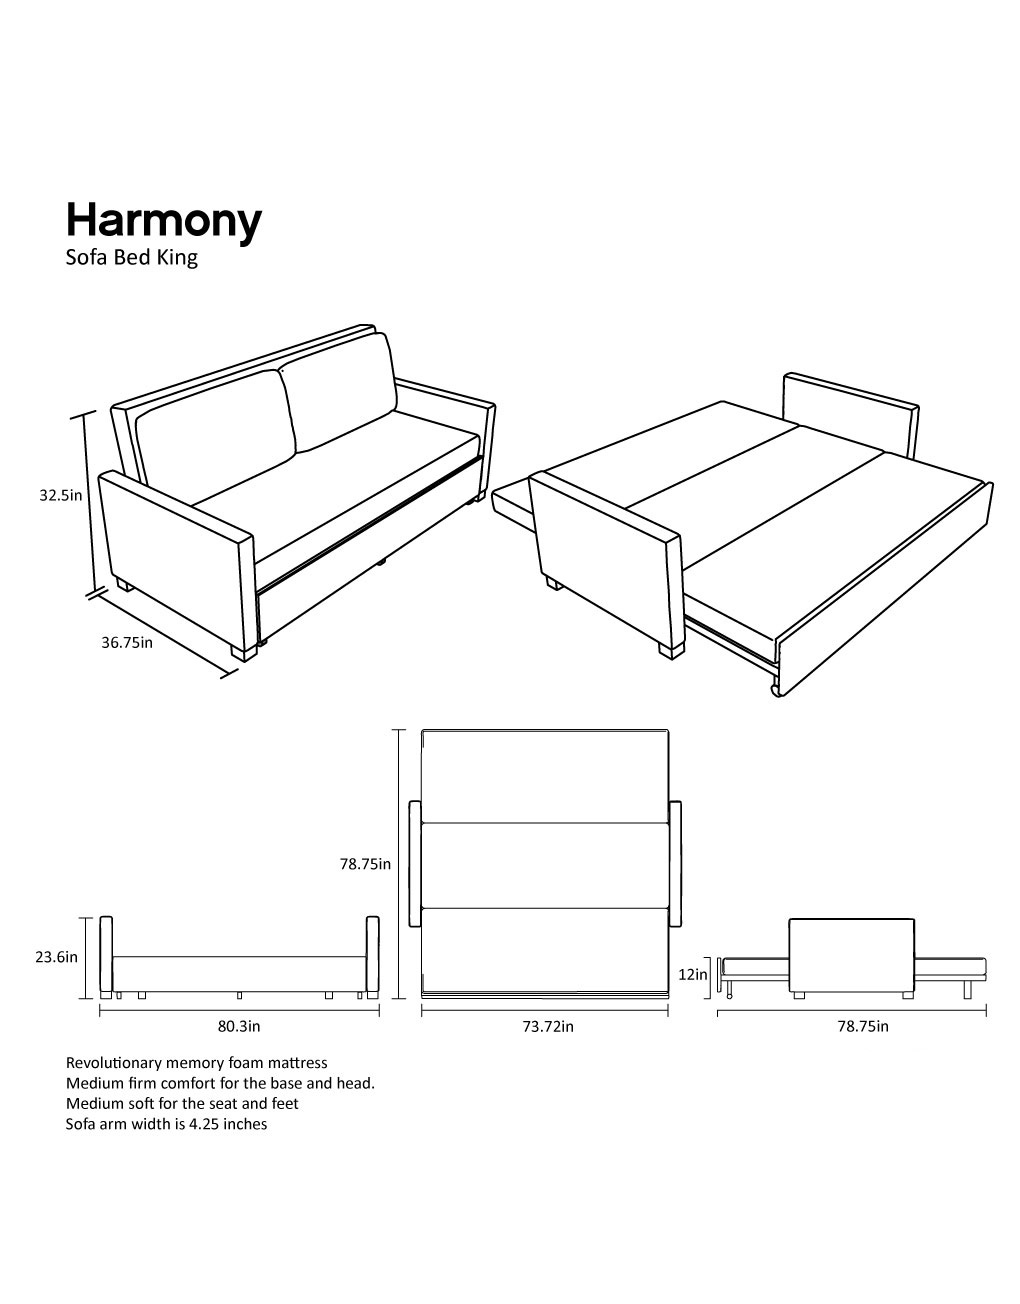 outline harmony king 1